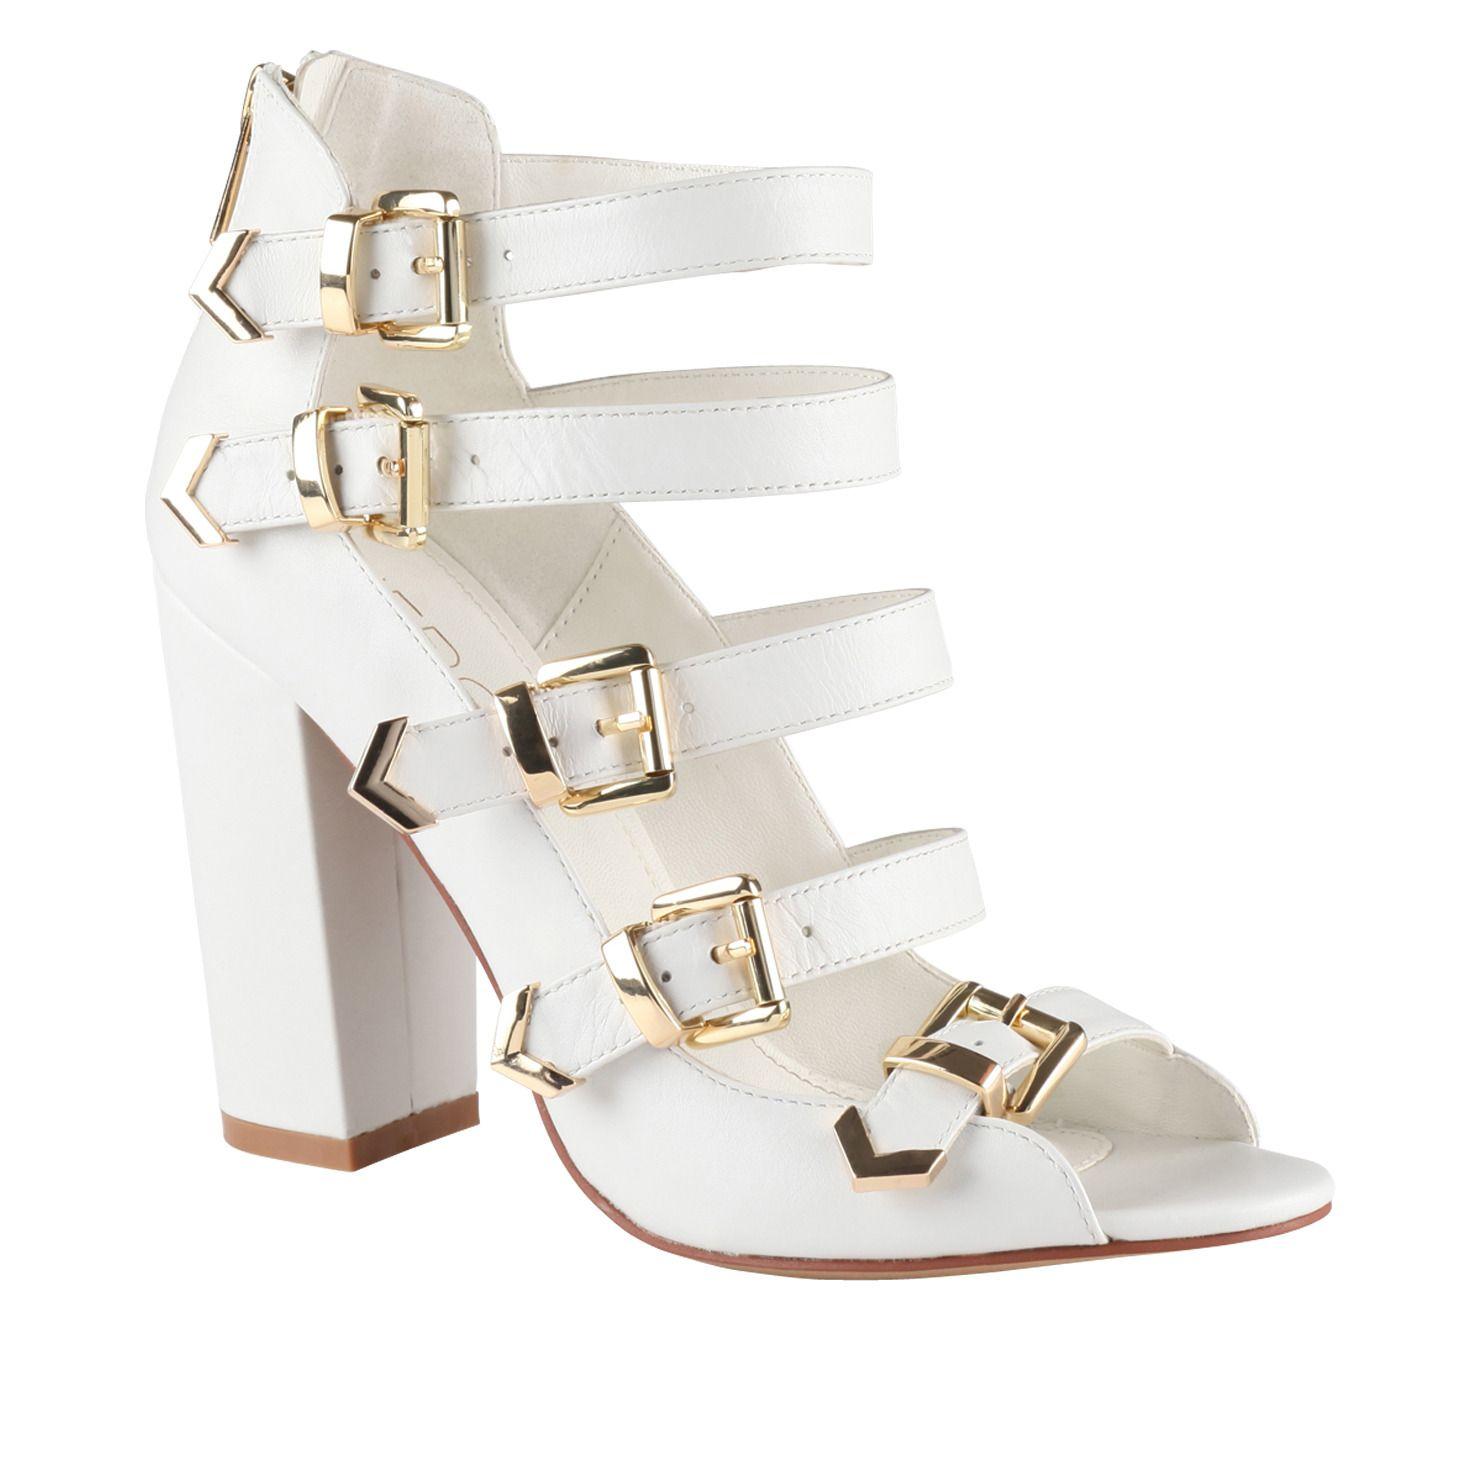 Bridal Shoes Aldo: ROSETTA - Women's Peep-toe Pumps Shoes ALDO Shoes.